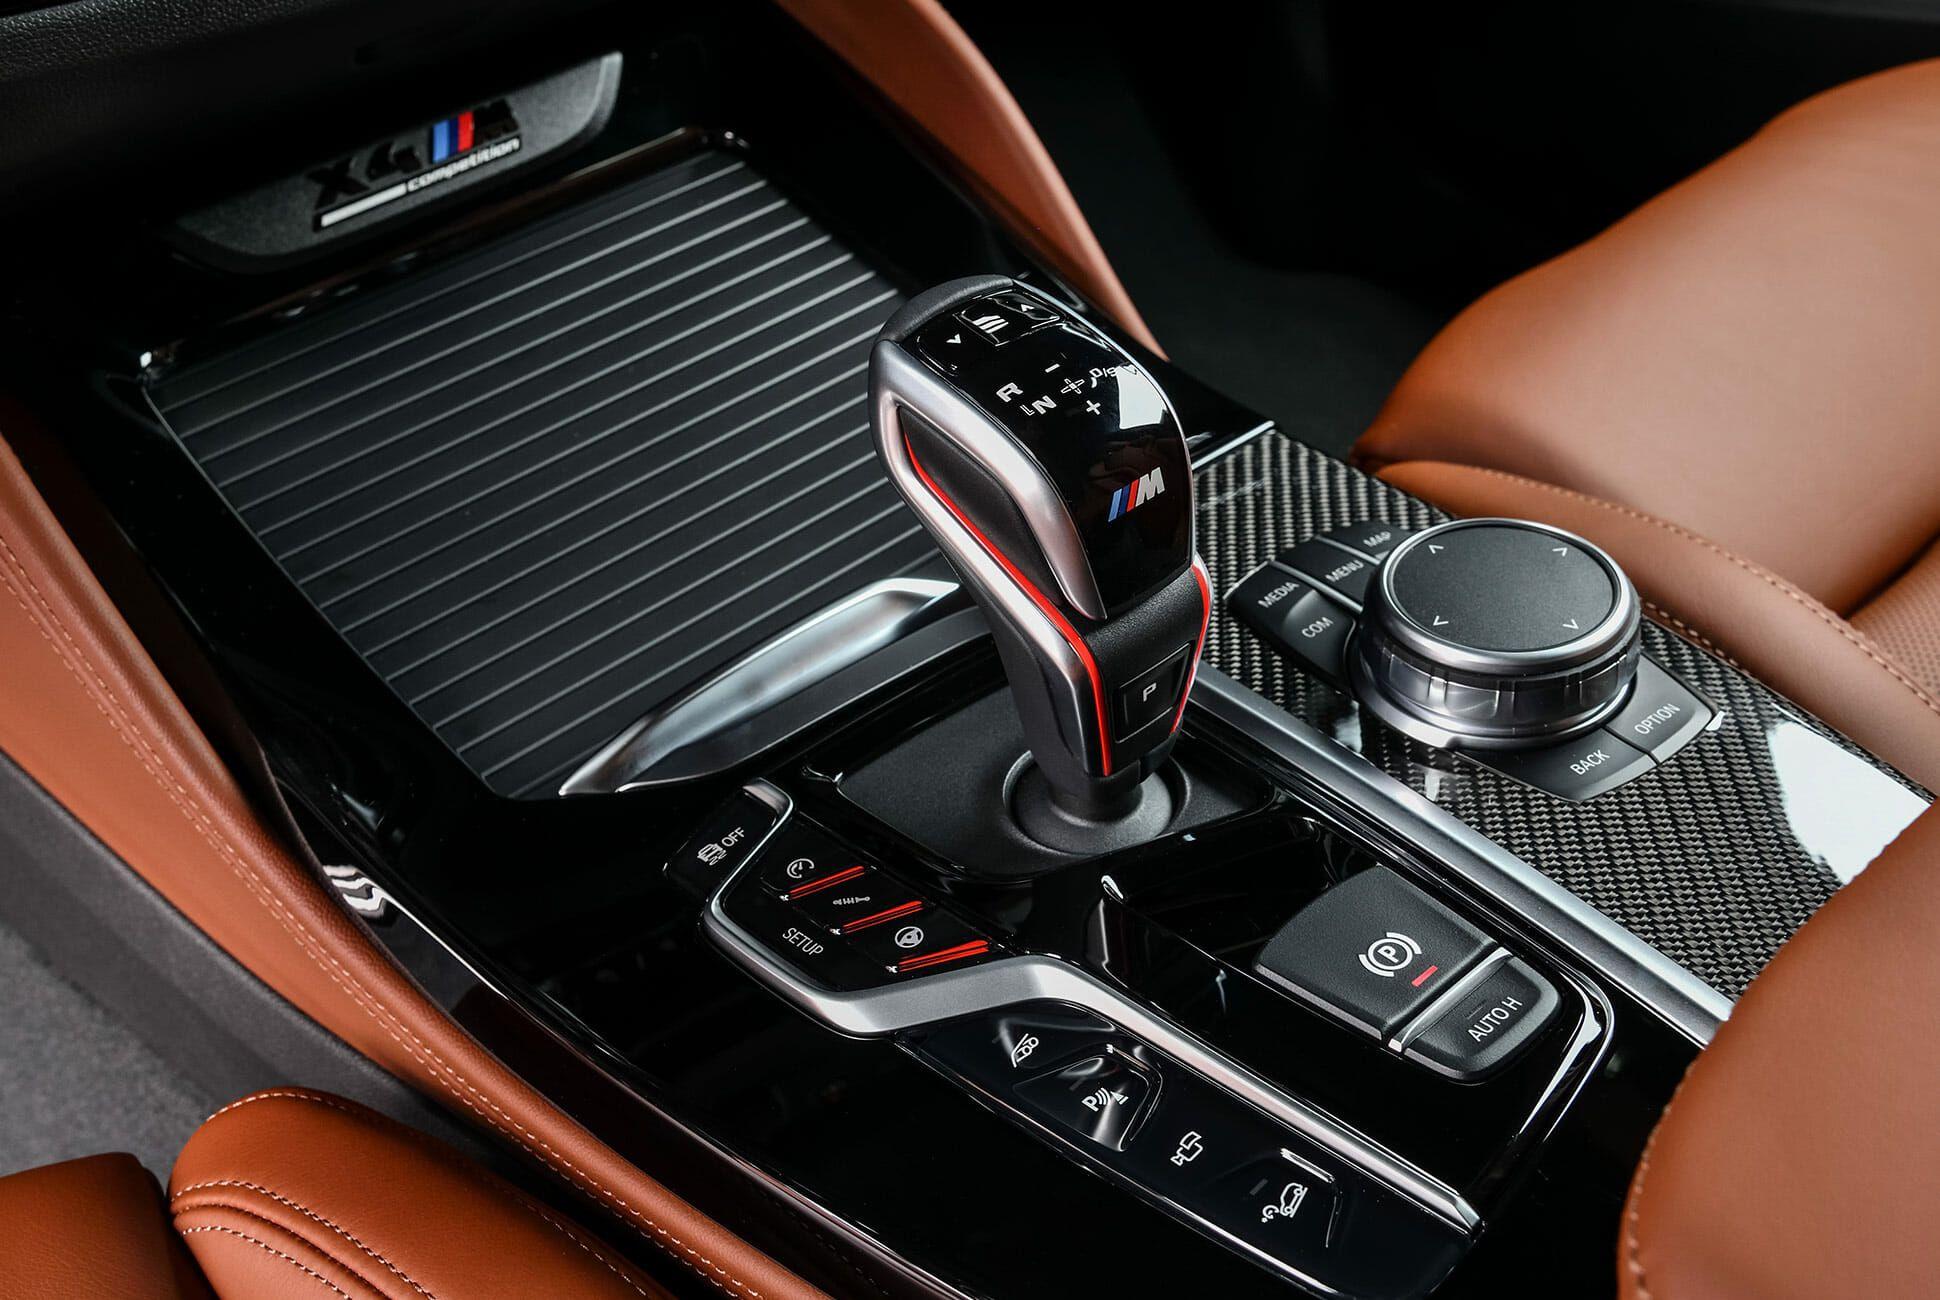 2020-BMW-X3-M-X4-M-Review-gear-patrol-slide-11